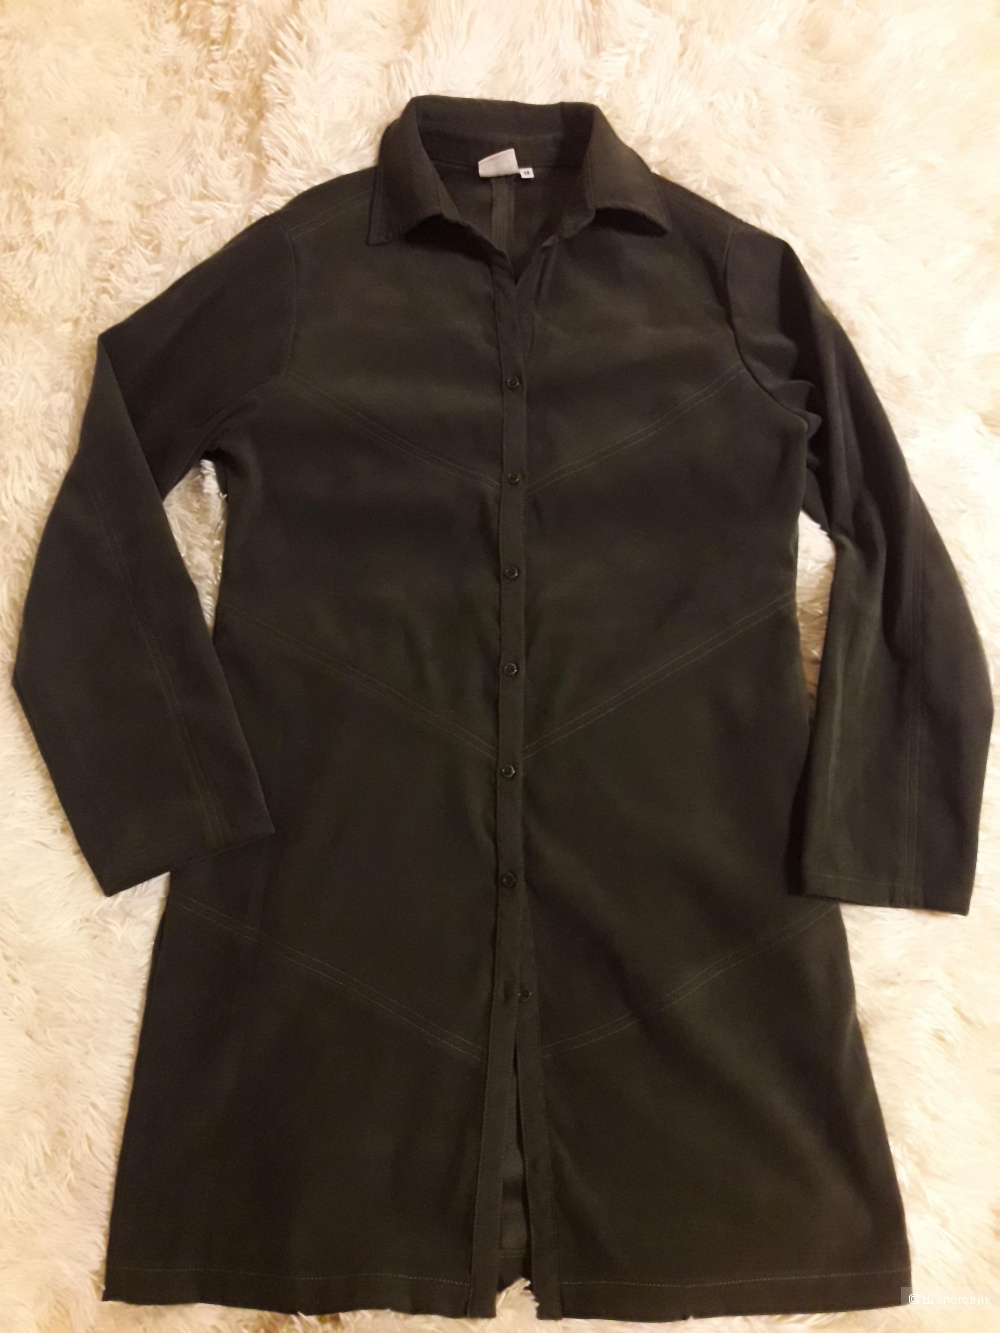 Комплект платье и рубашка, размер 42-44